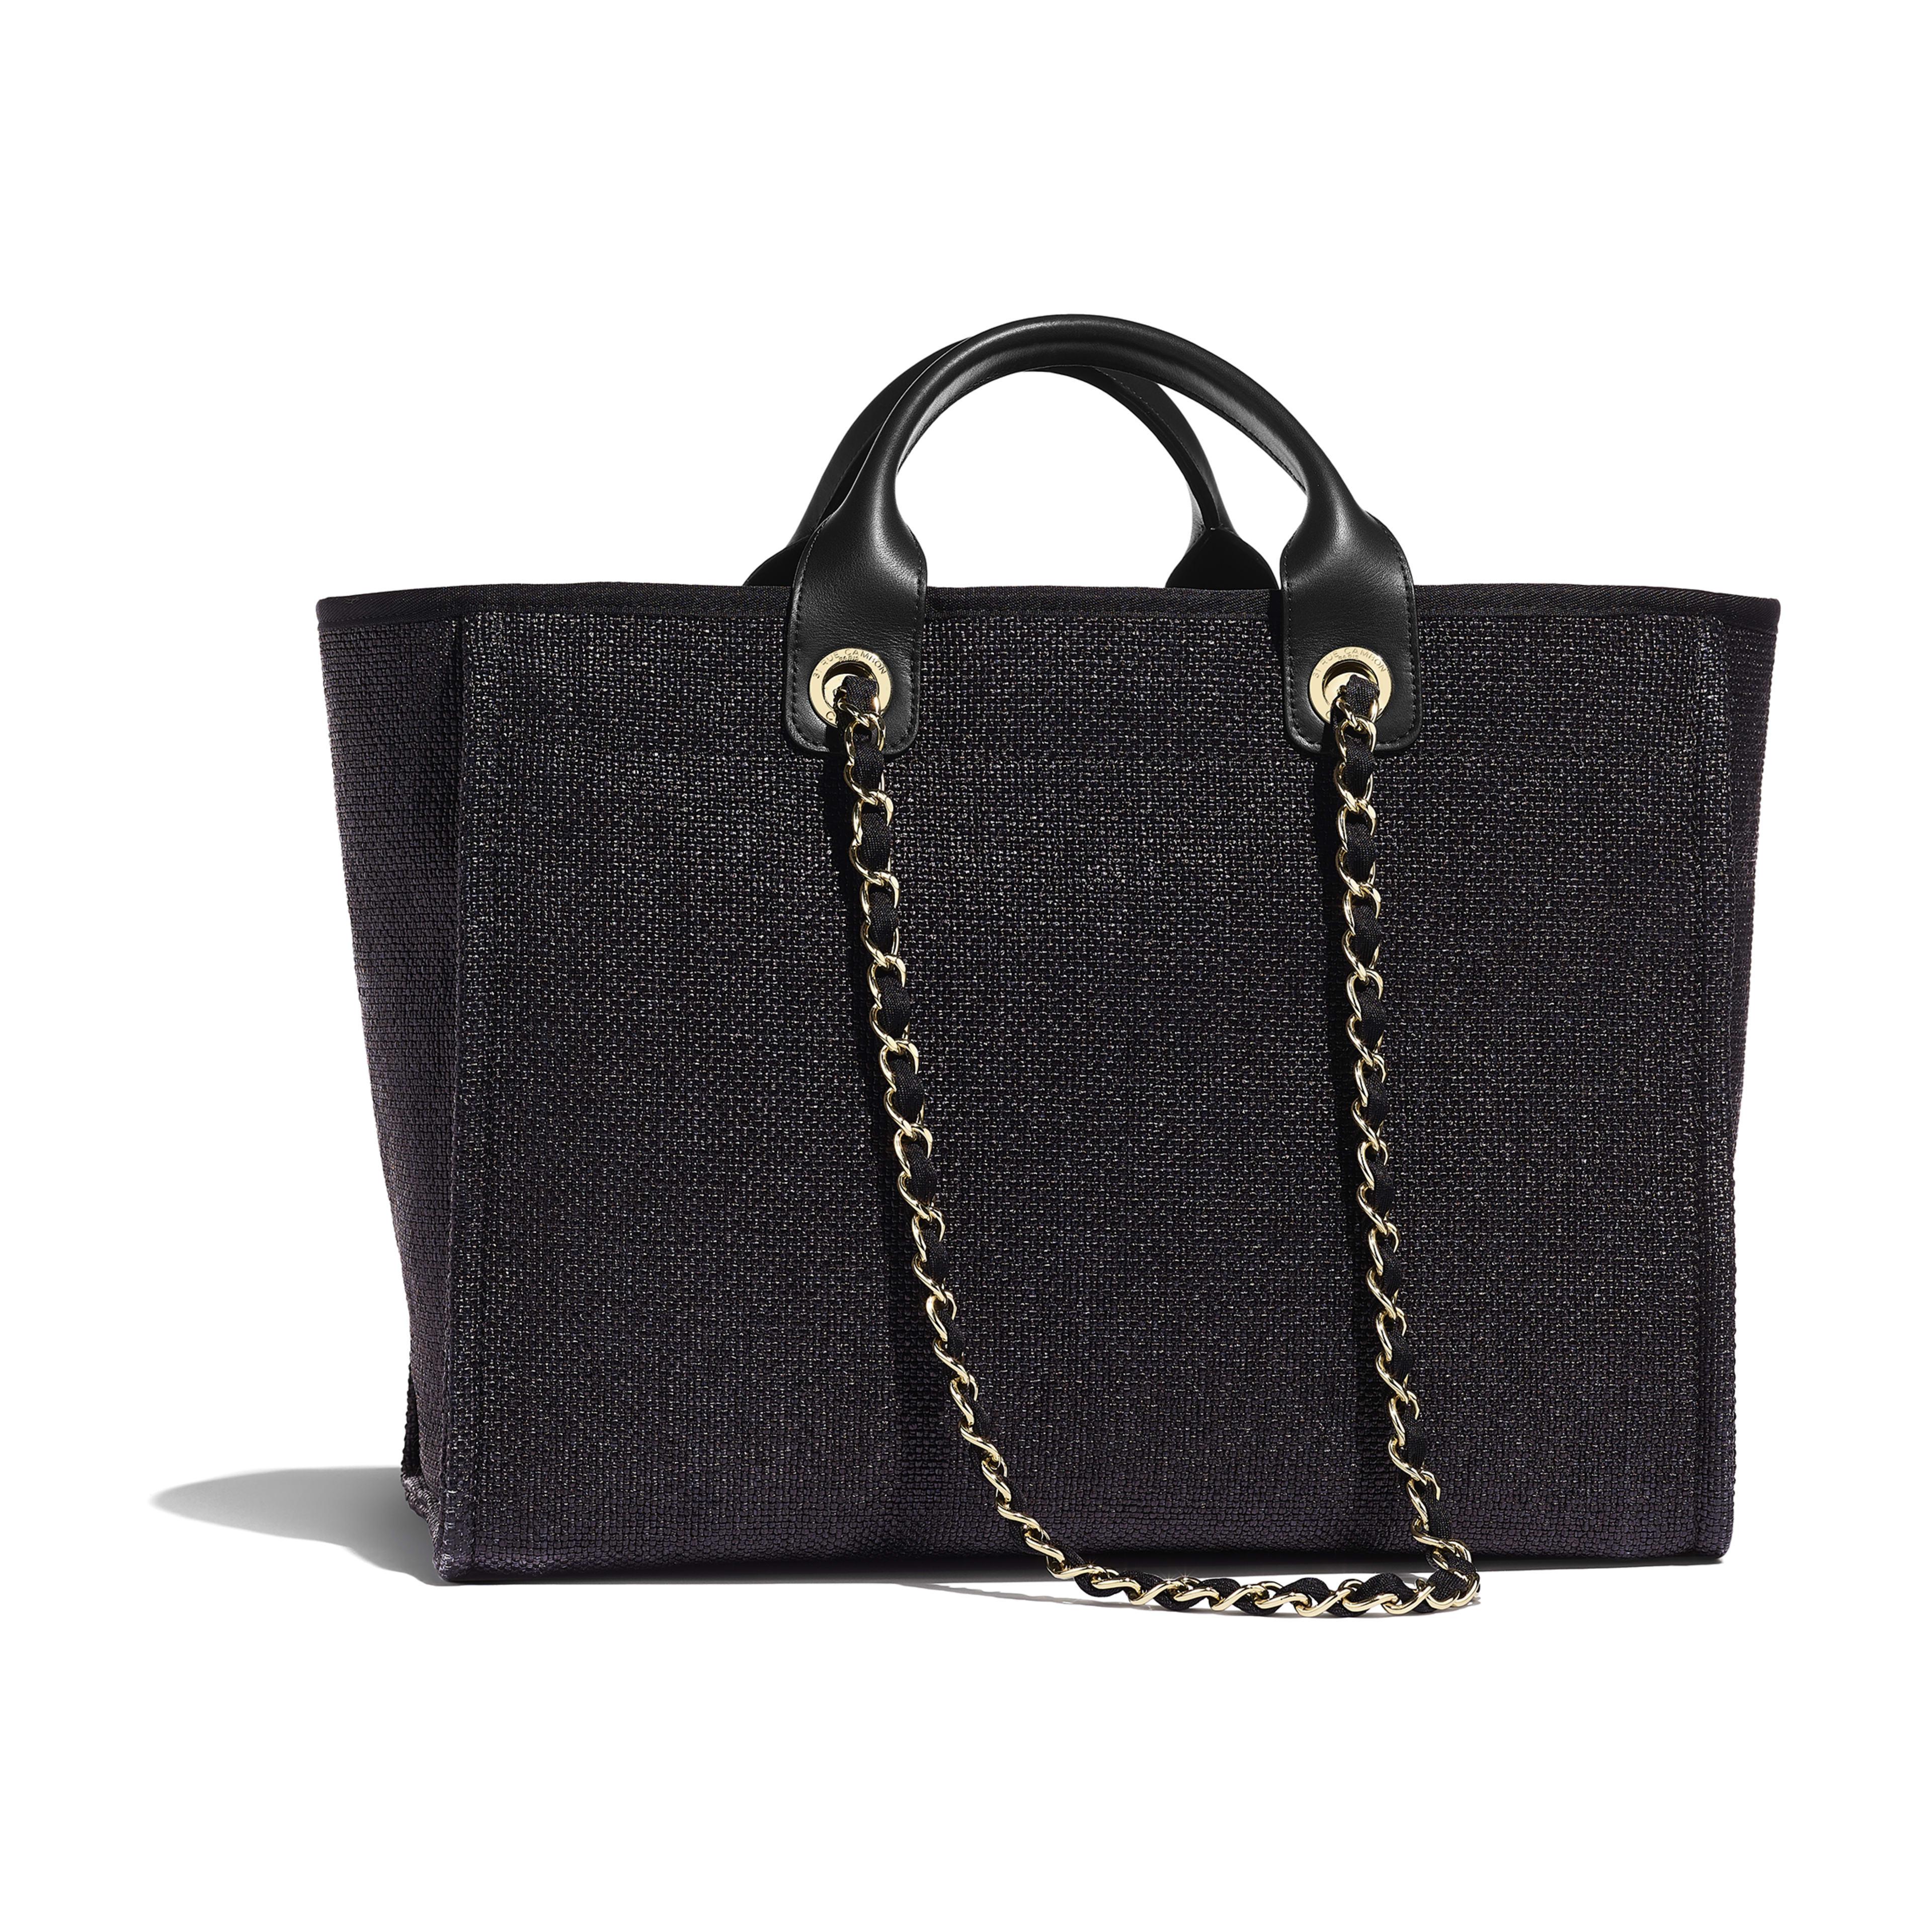 Shopping Bag - Black - Cotton, Nylon, Calfskin & Gold-Tone Metal - Alternative view - see full sized version